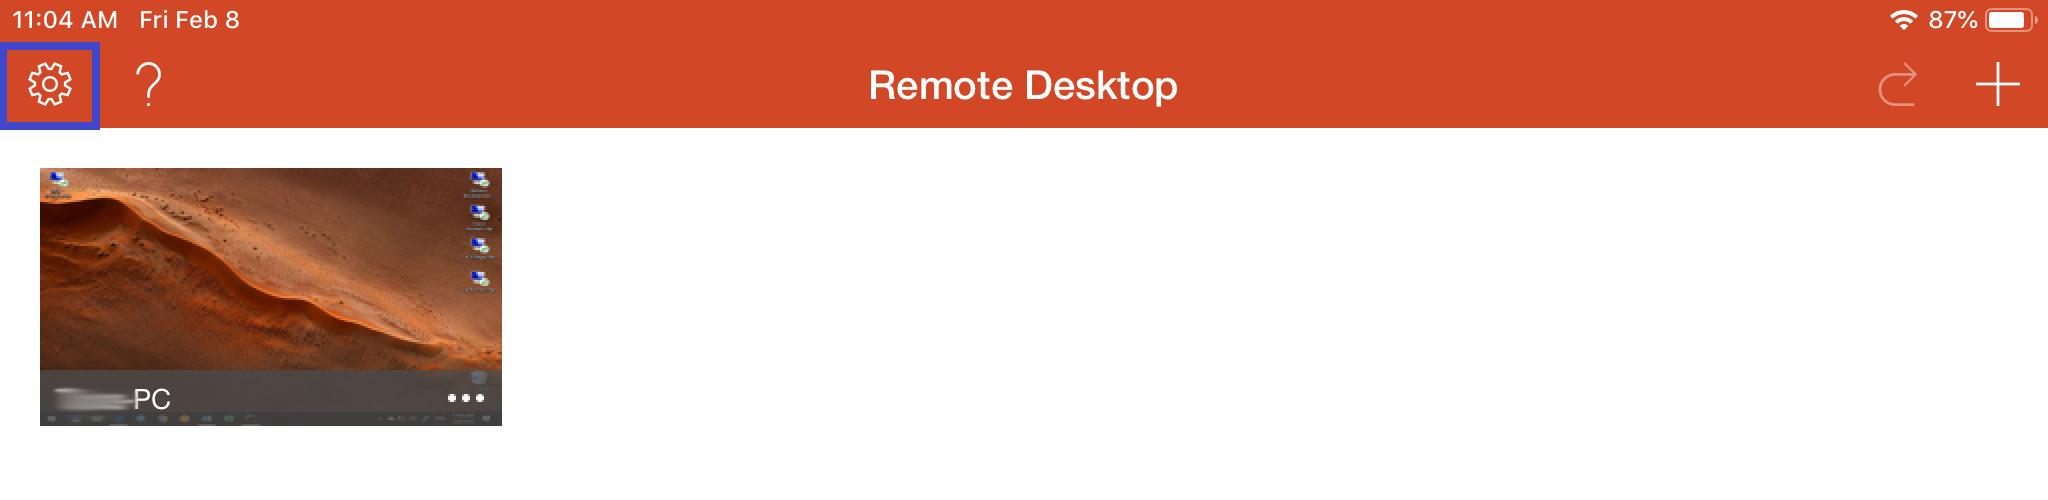 remote desktop connection mac to windows